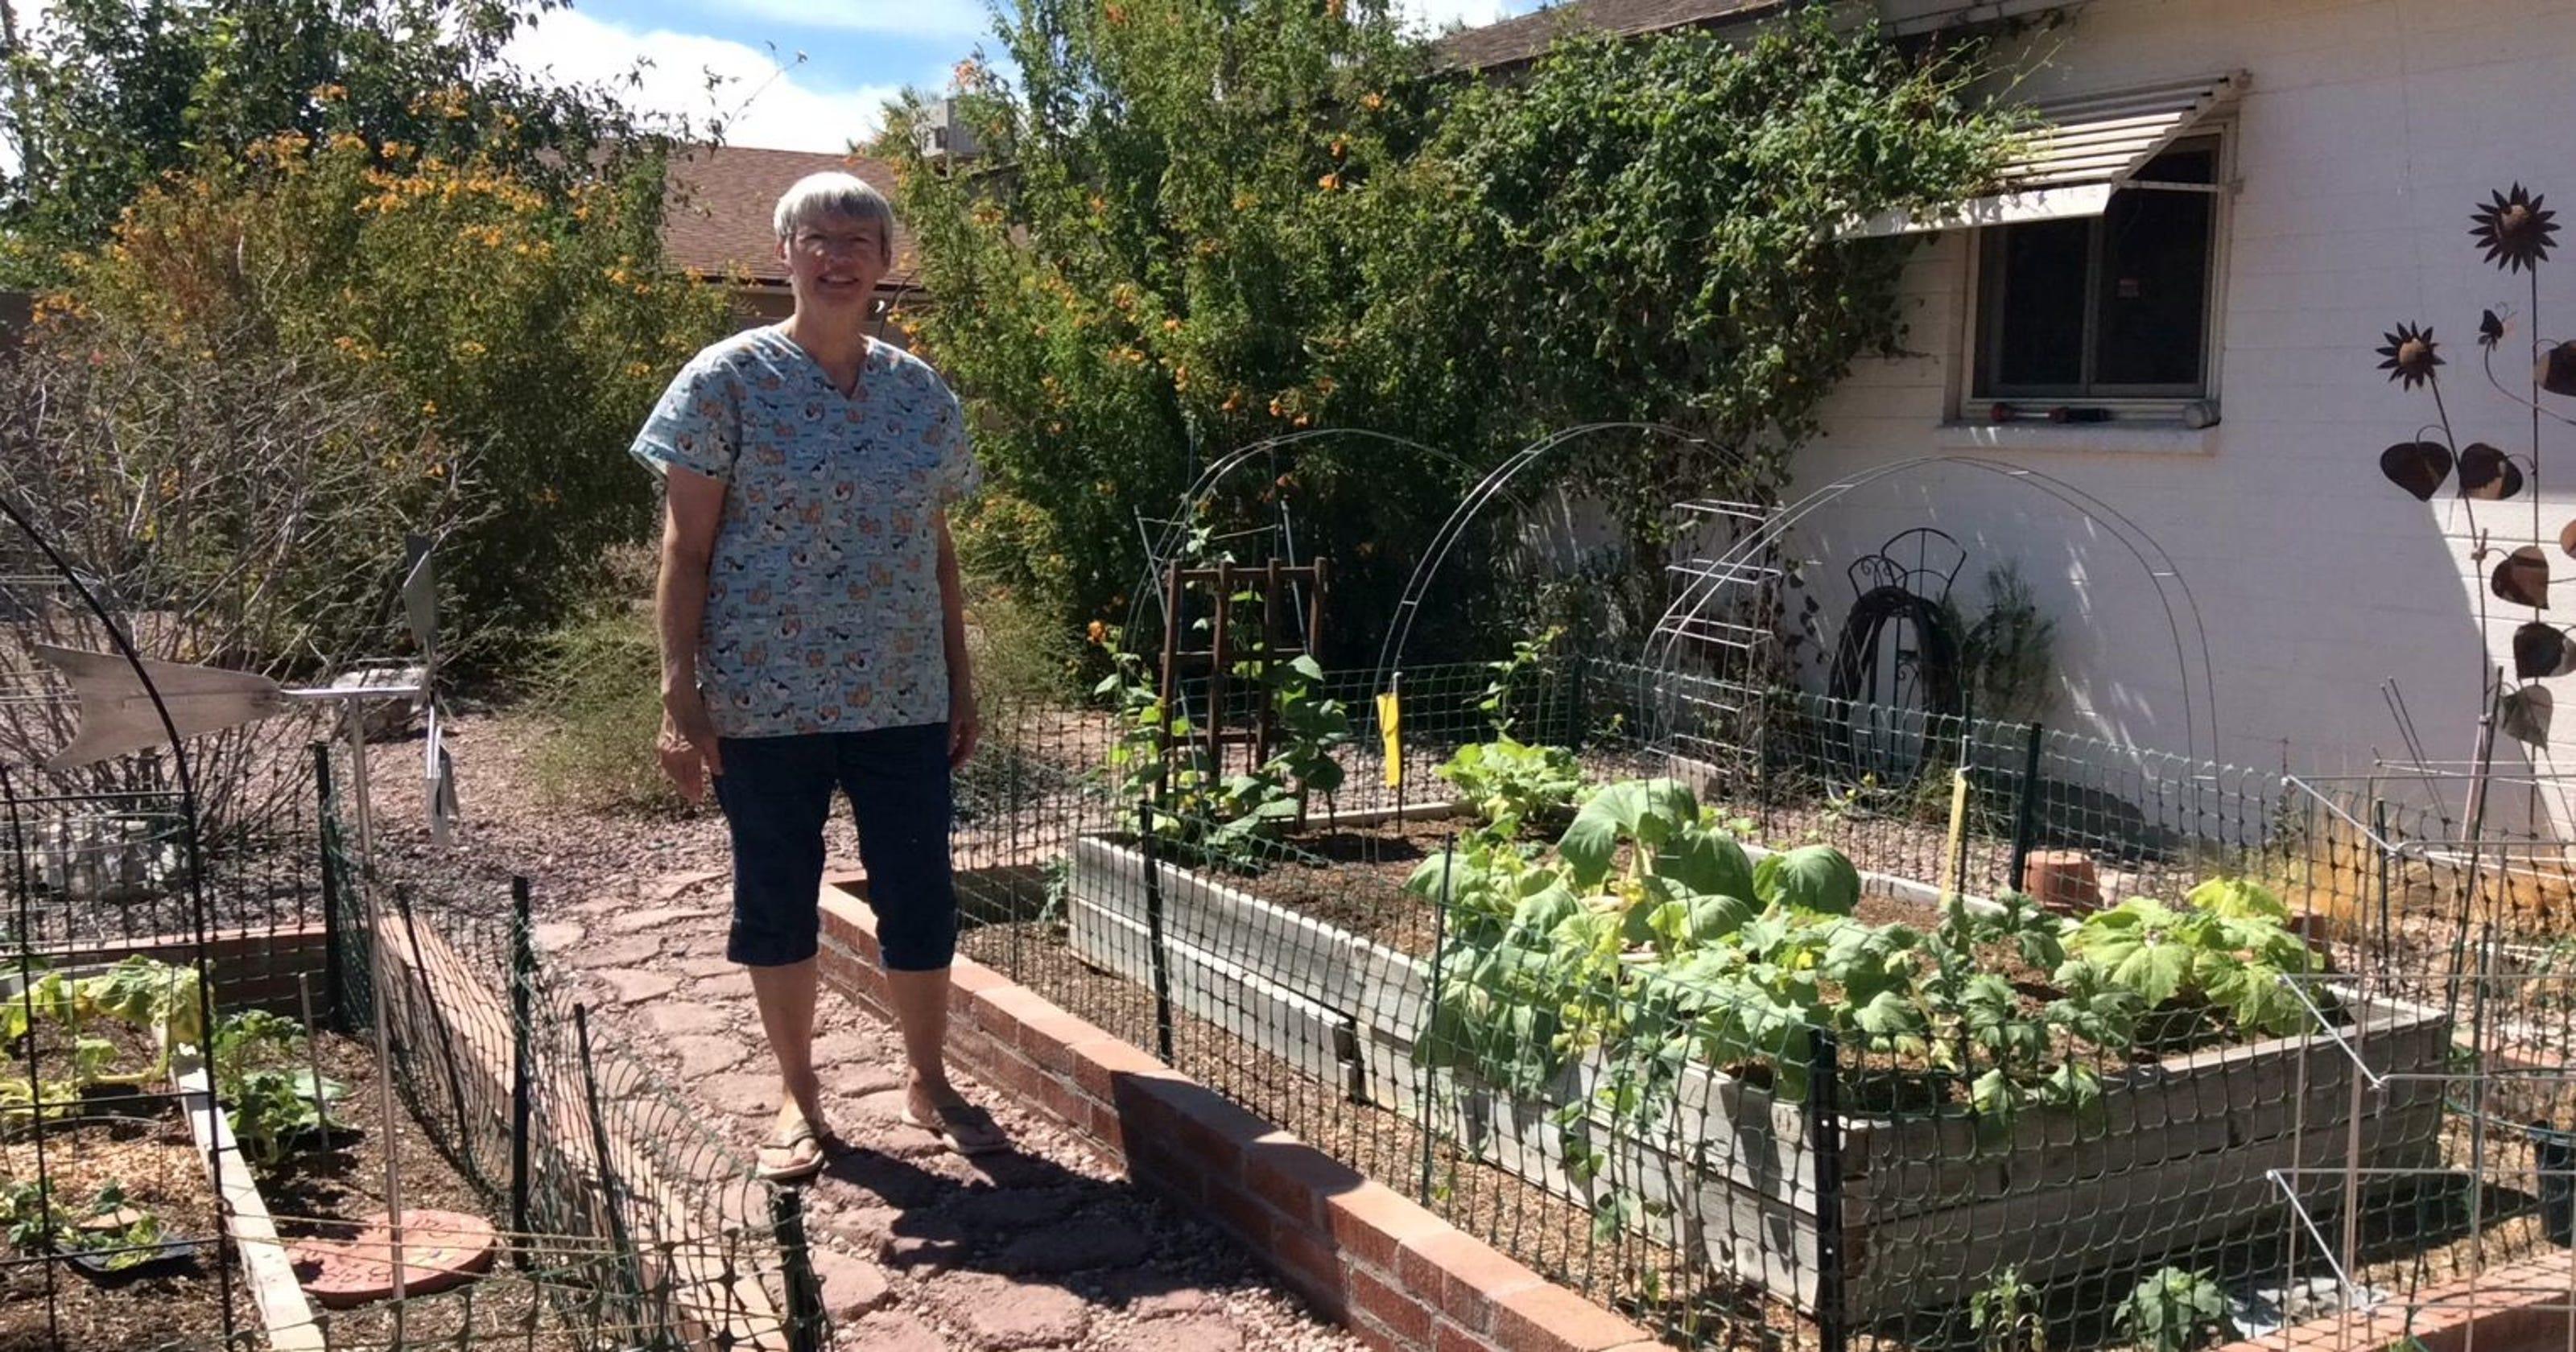 10 tips for Arizona spring planting season Zone A Garden Bed Designs Ideas Html on